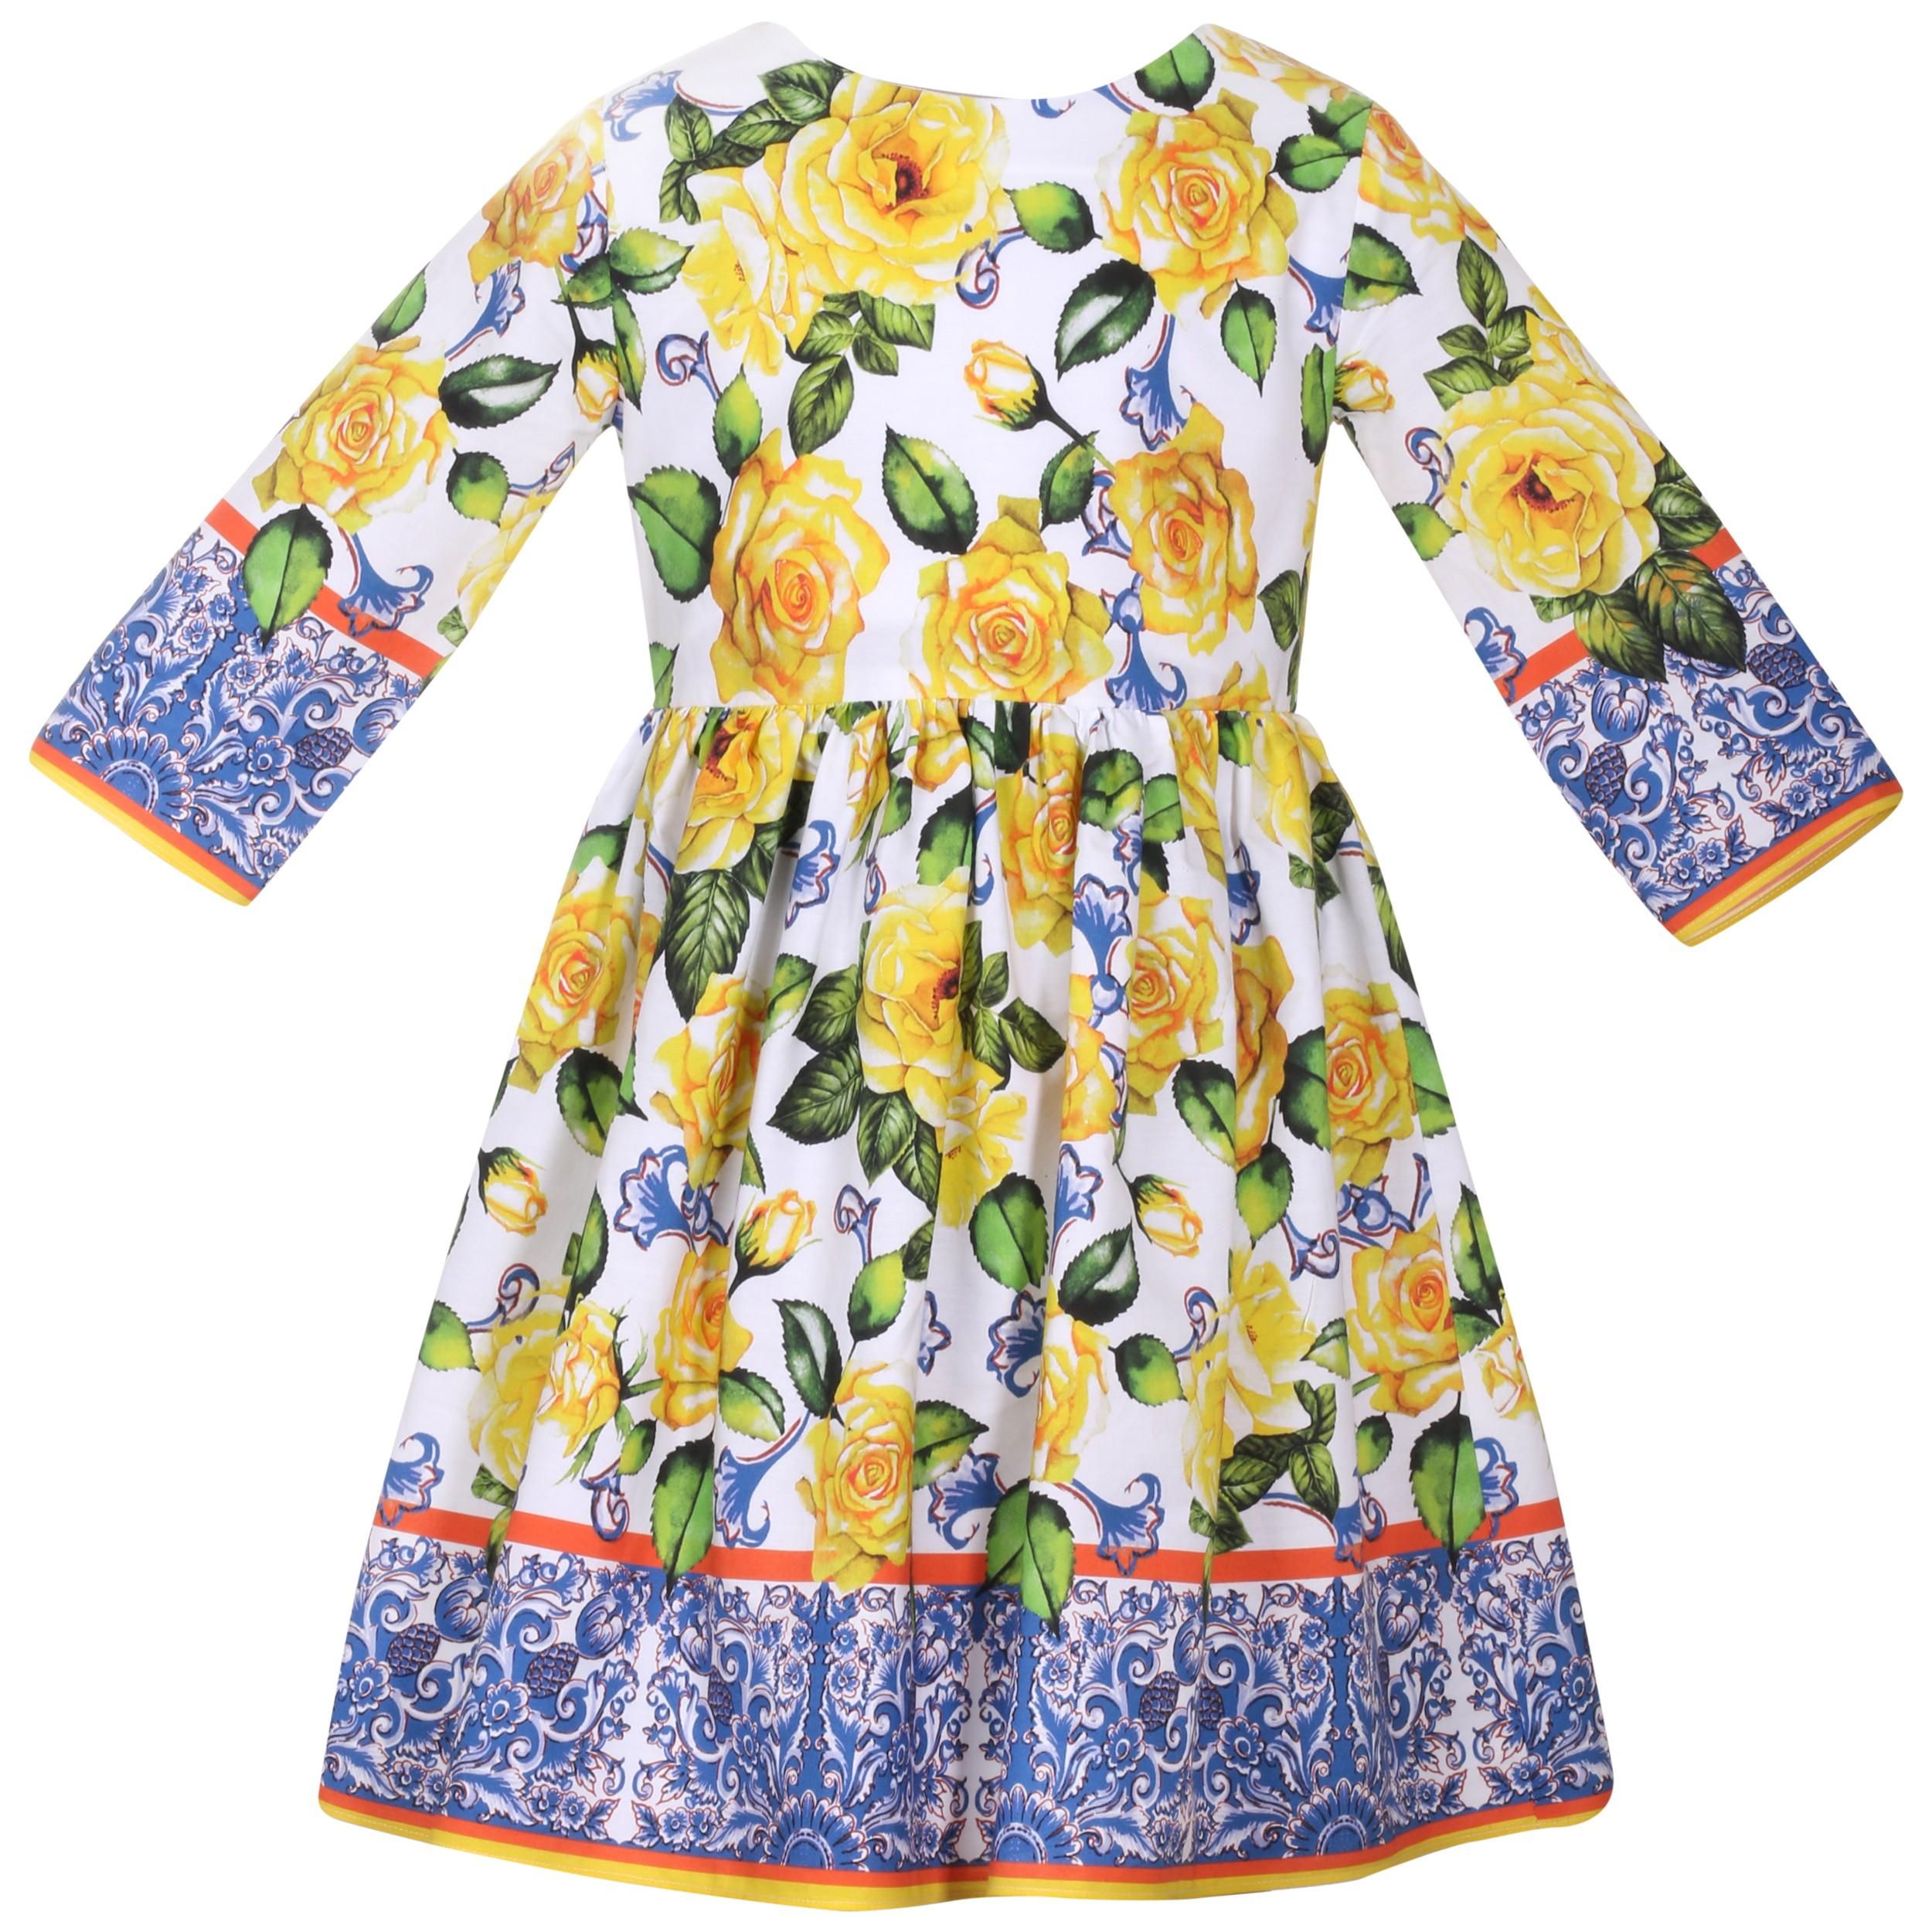 c9a96f8f2 S19P5 Patachou Yellow Rose Bright Print Dress – Buttoned Up ...